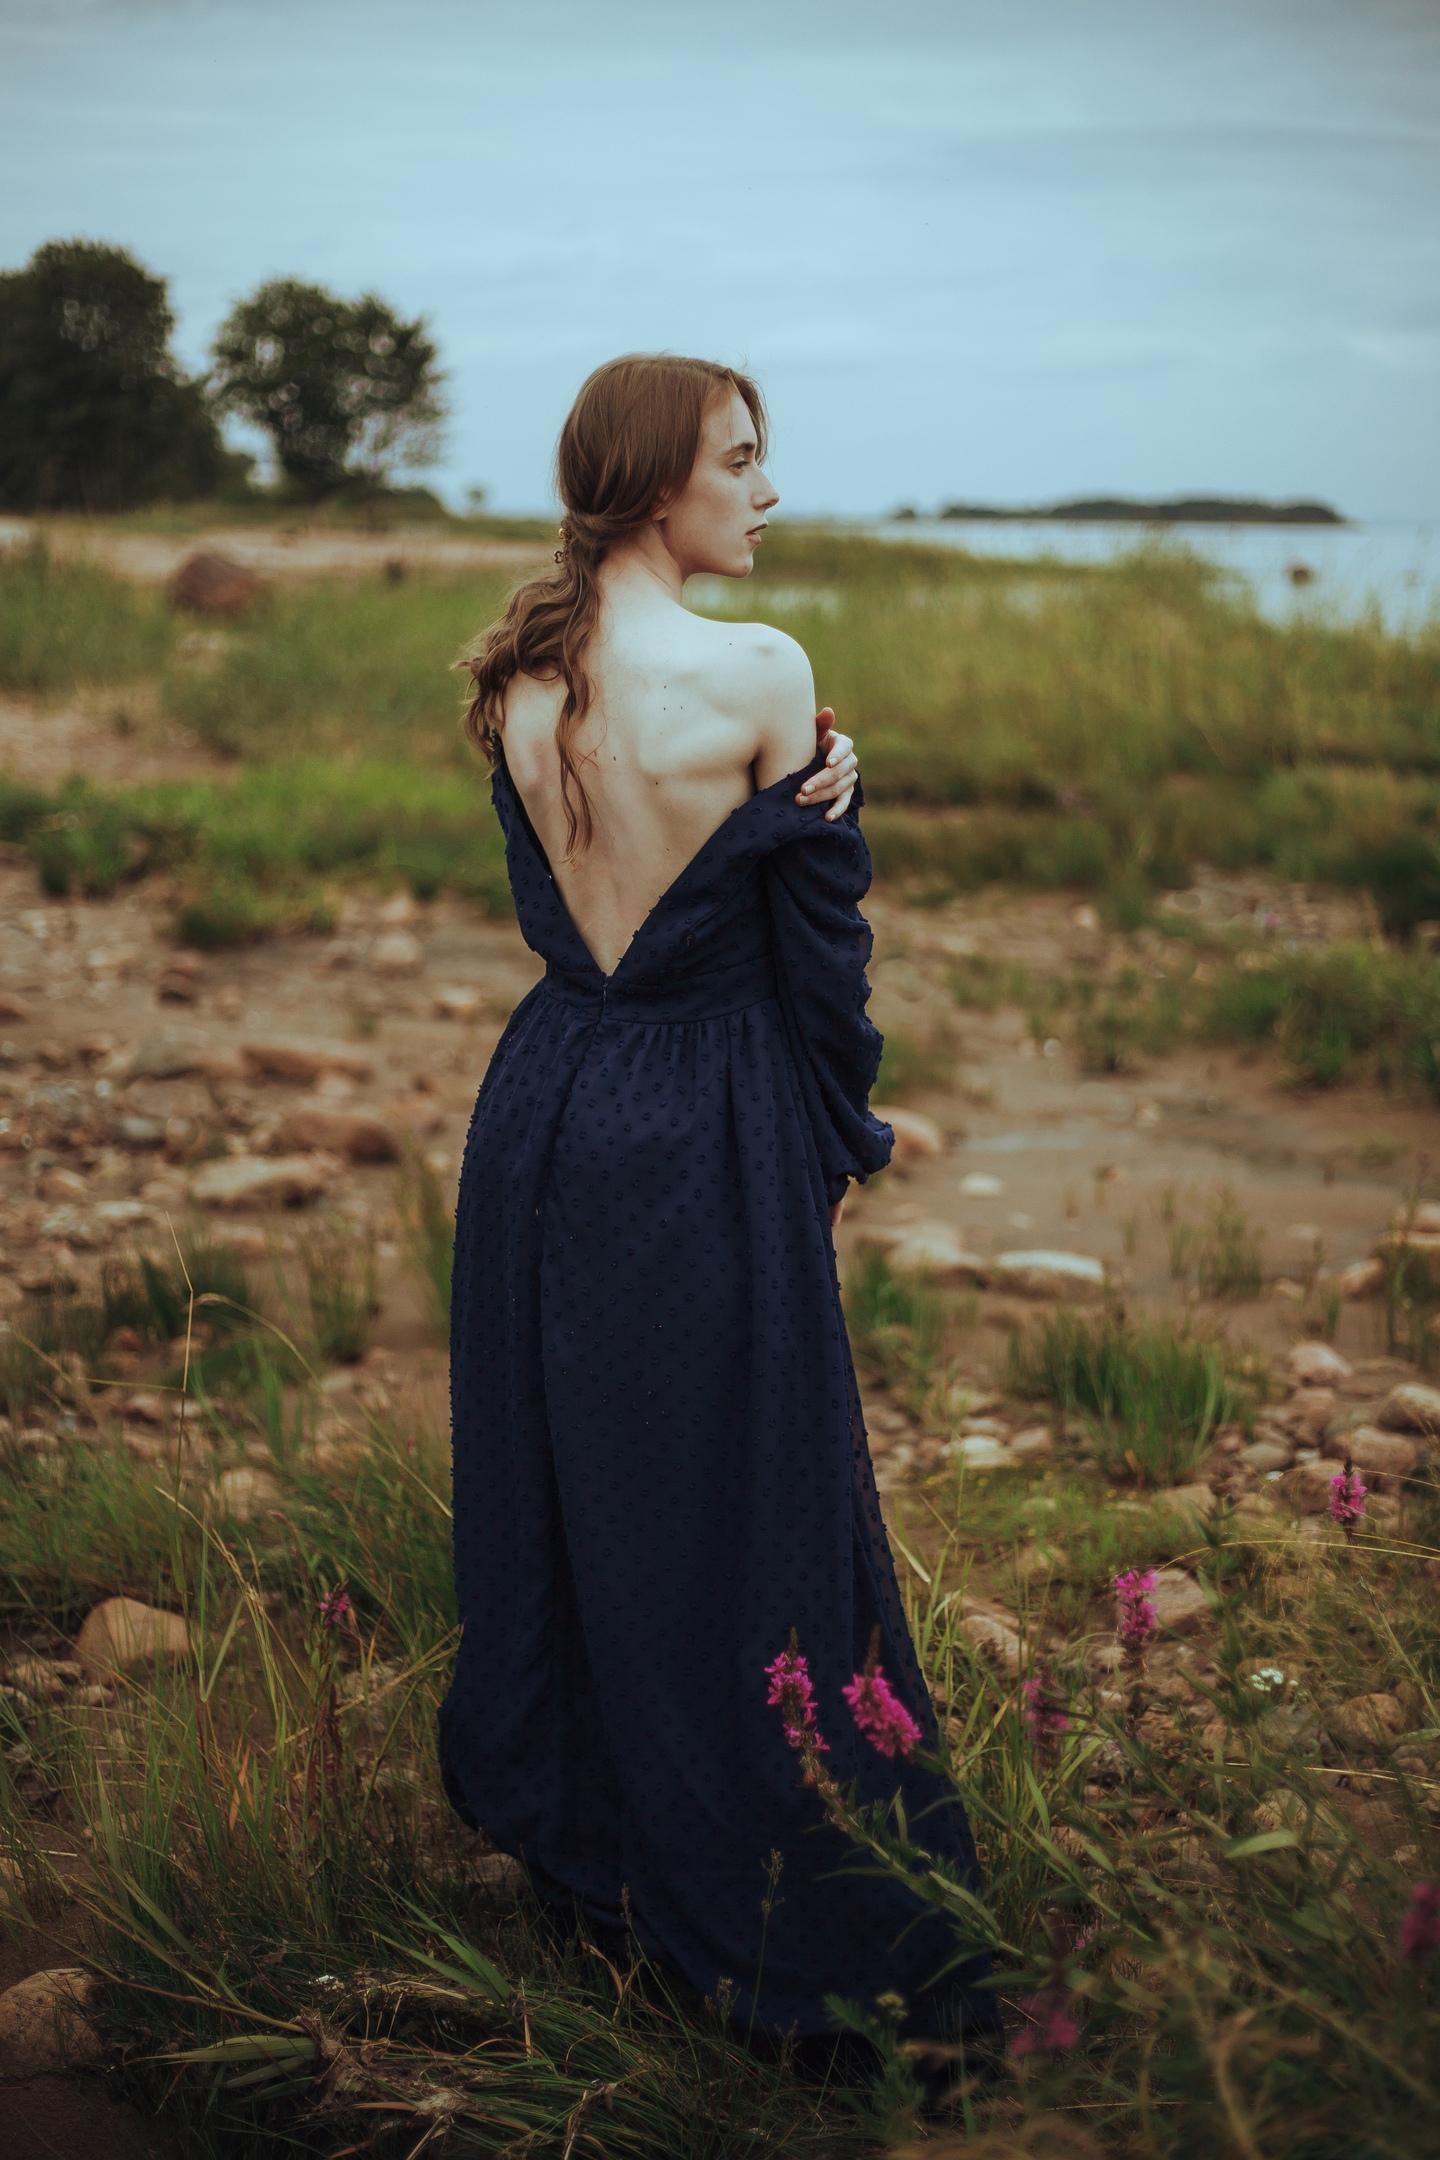 https://www.youngfolks.ru/pub/photographer-anna-grebennik-114188